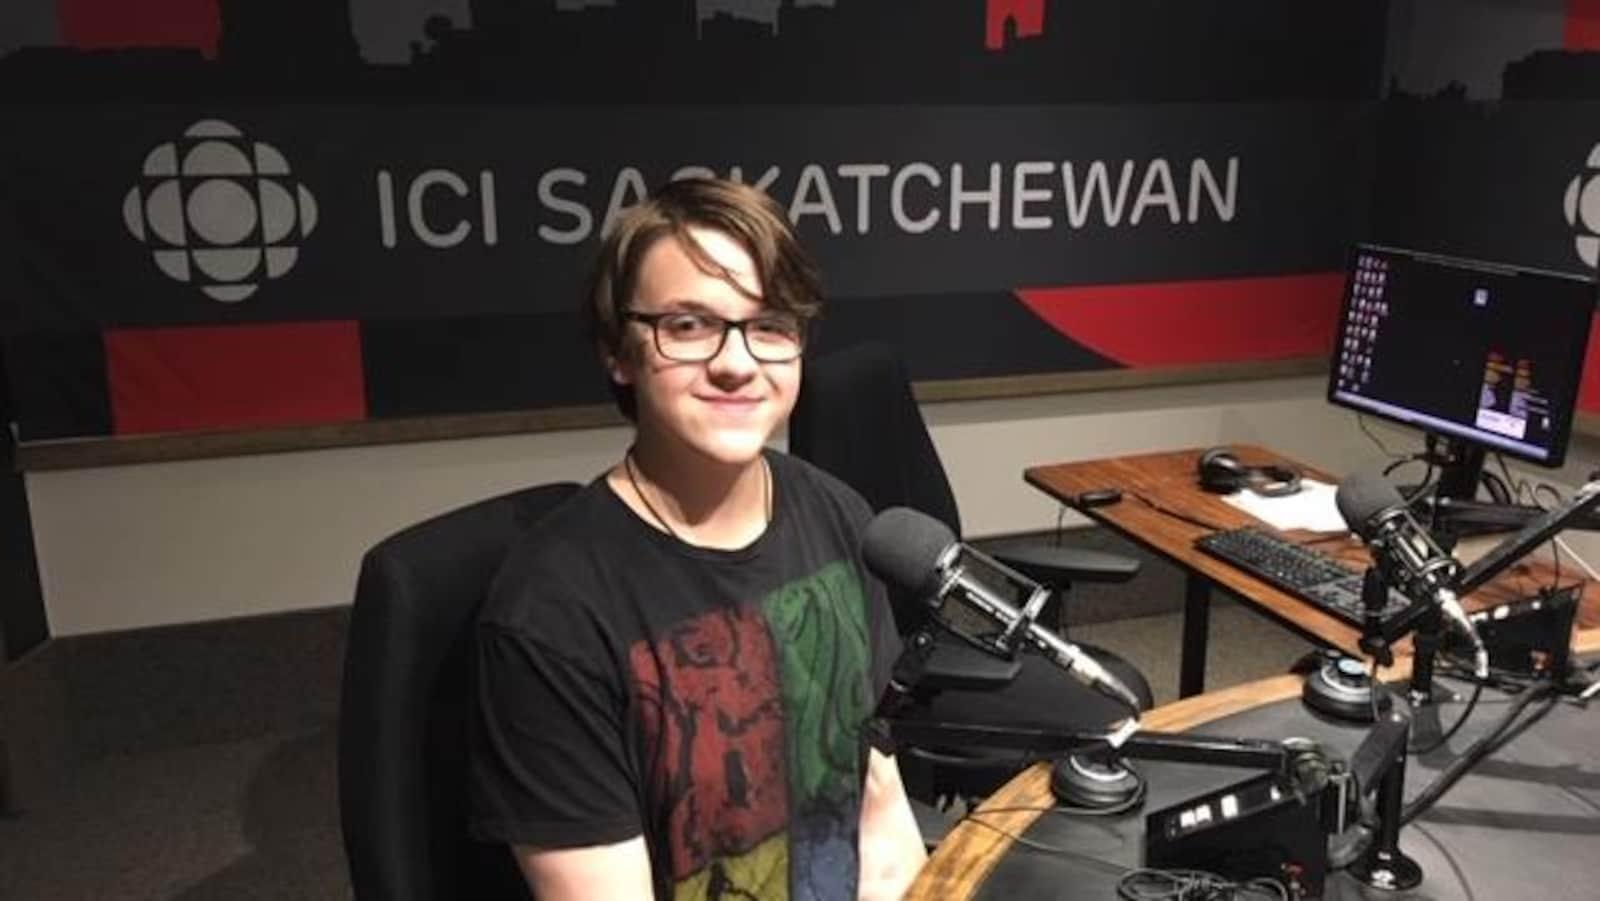 Isaac Mulder est dans le studio radio de Radio-Canada en Saskatchewan.